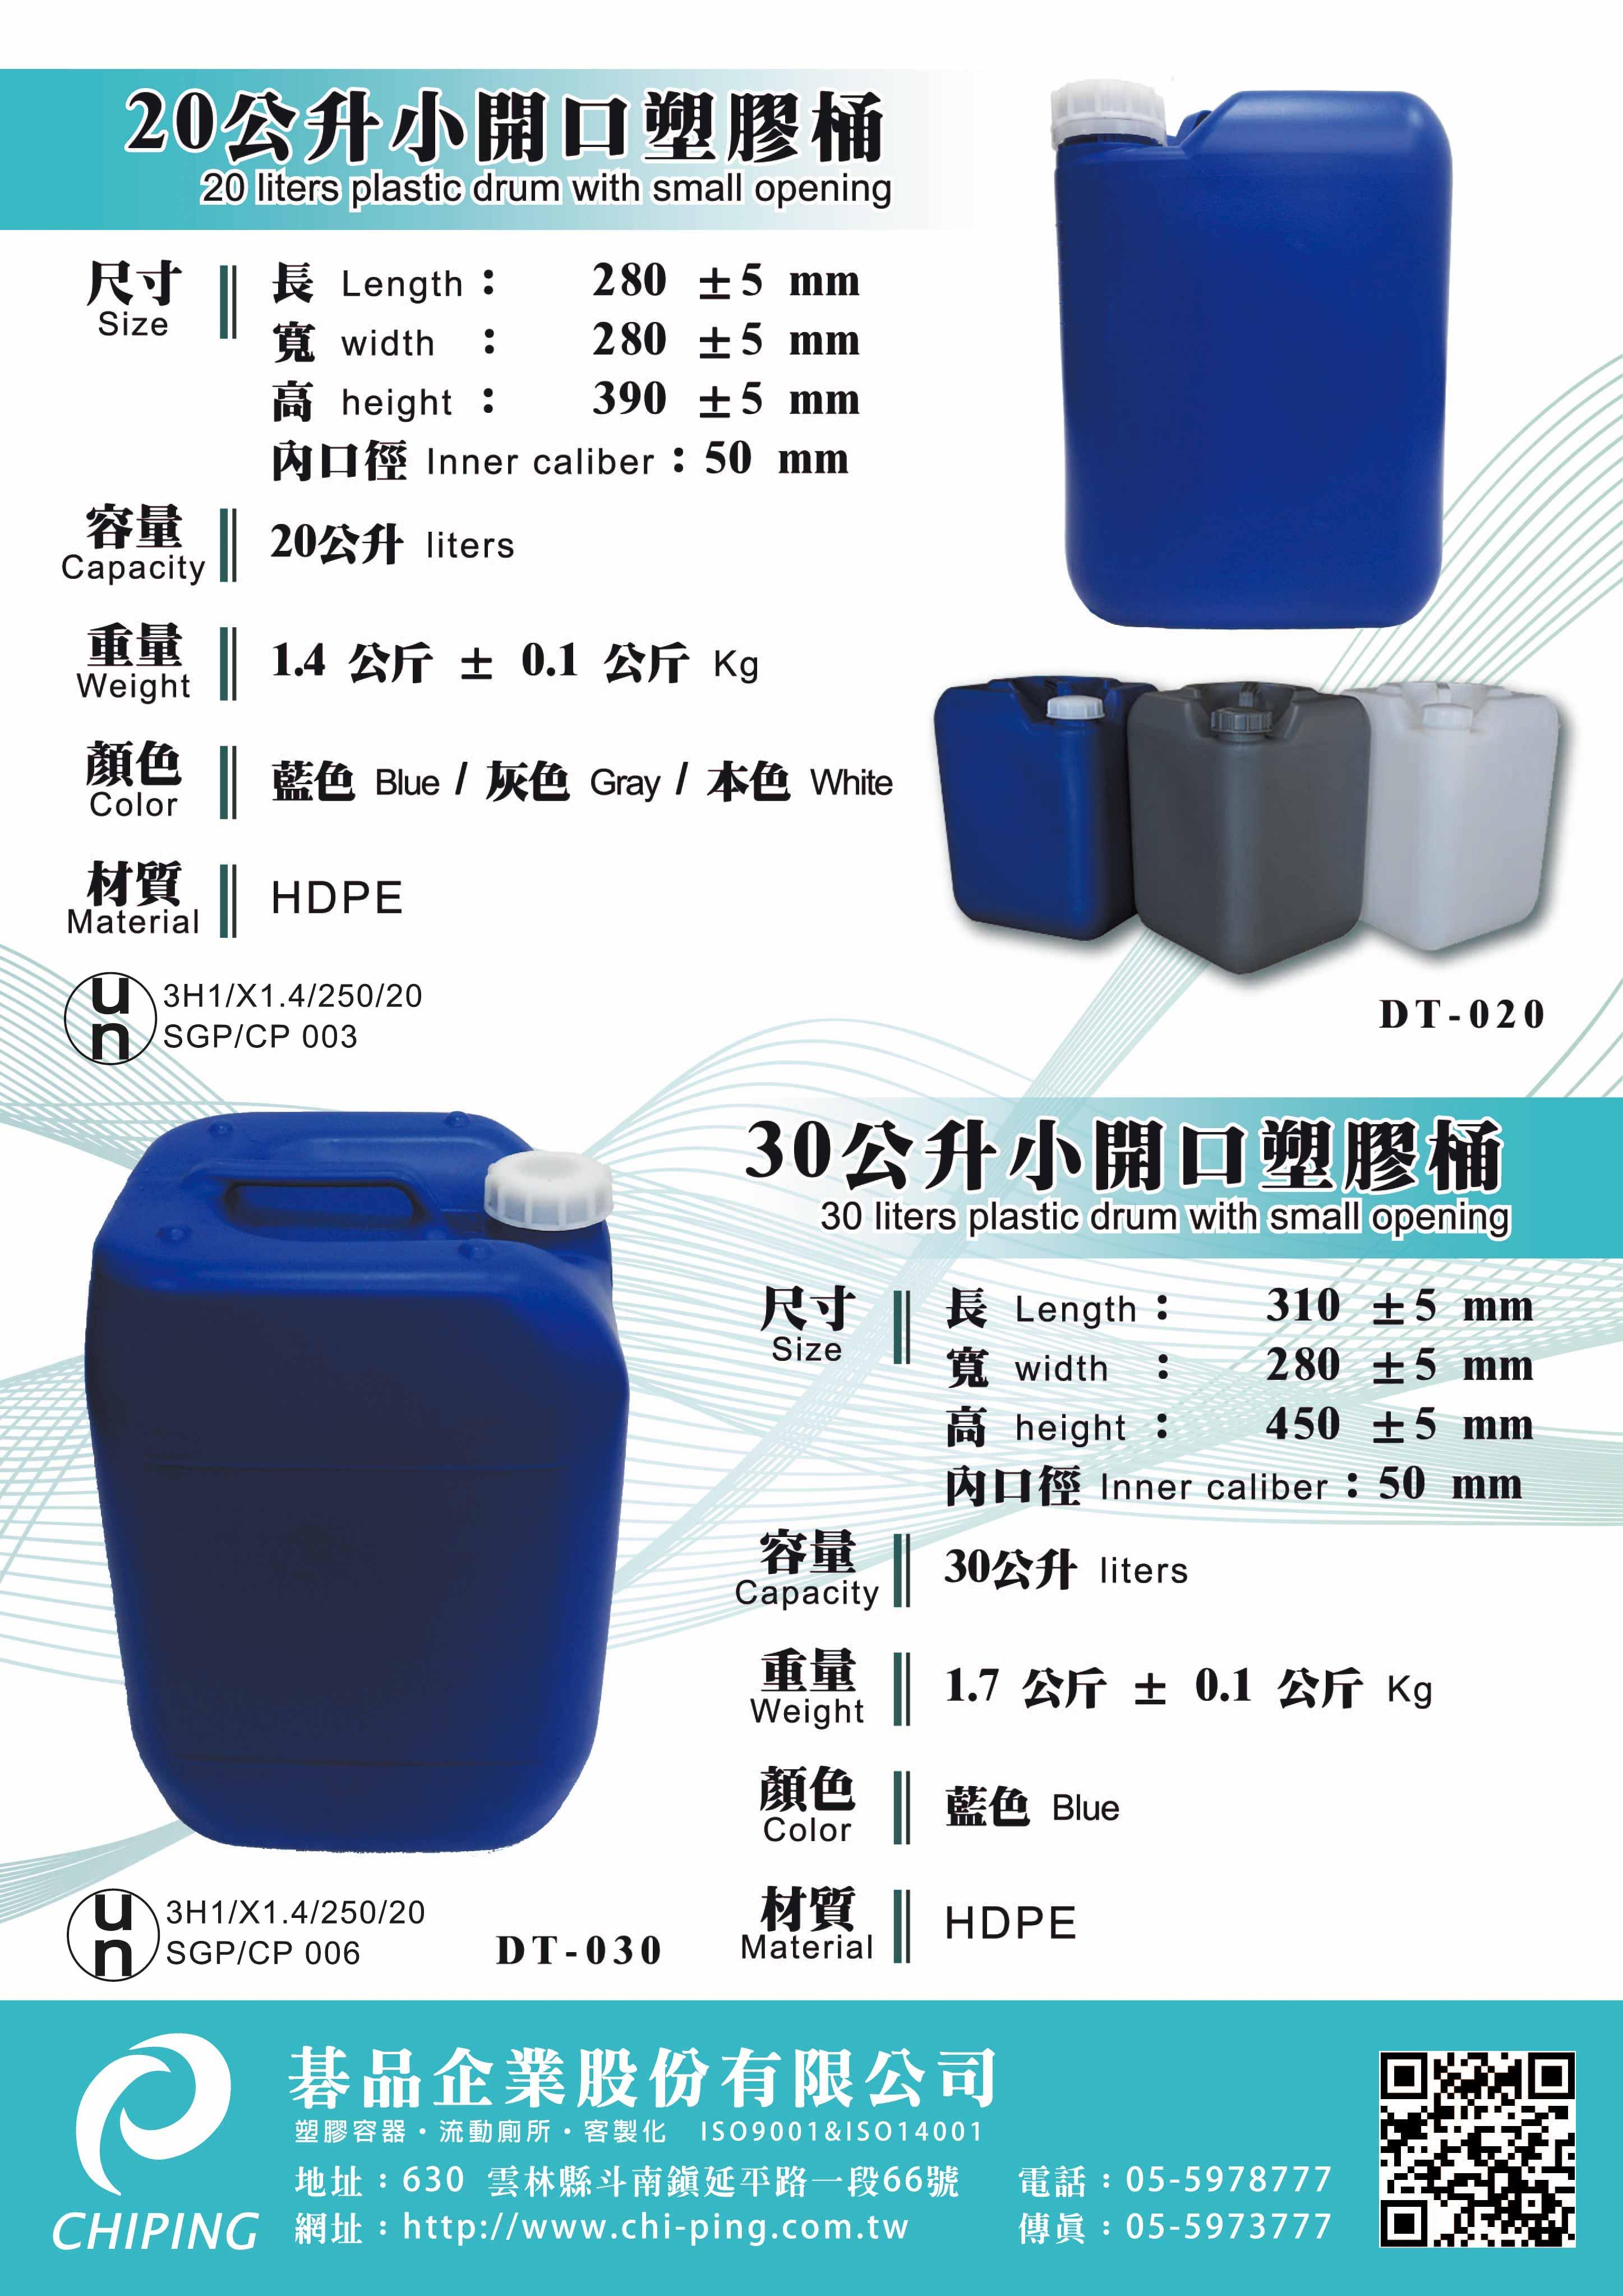 proimages/2020塑膠容器/2030DM-2.jpg